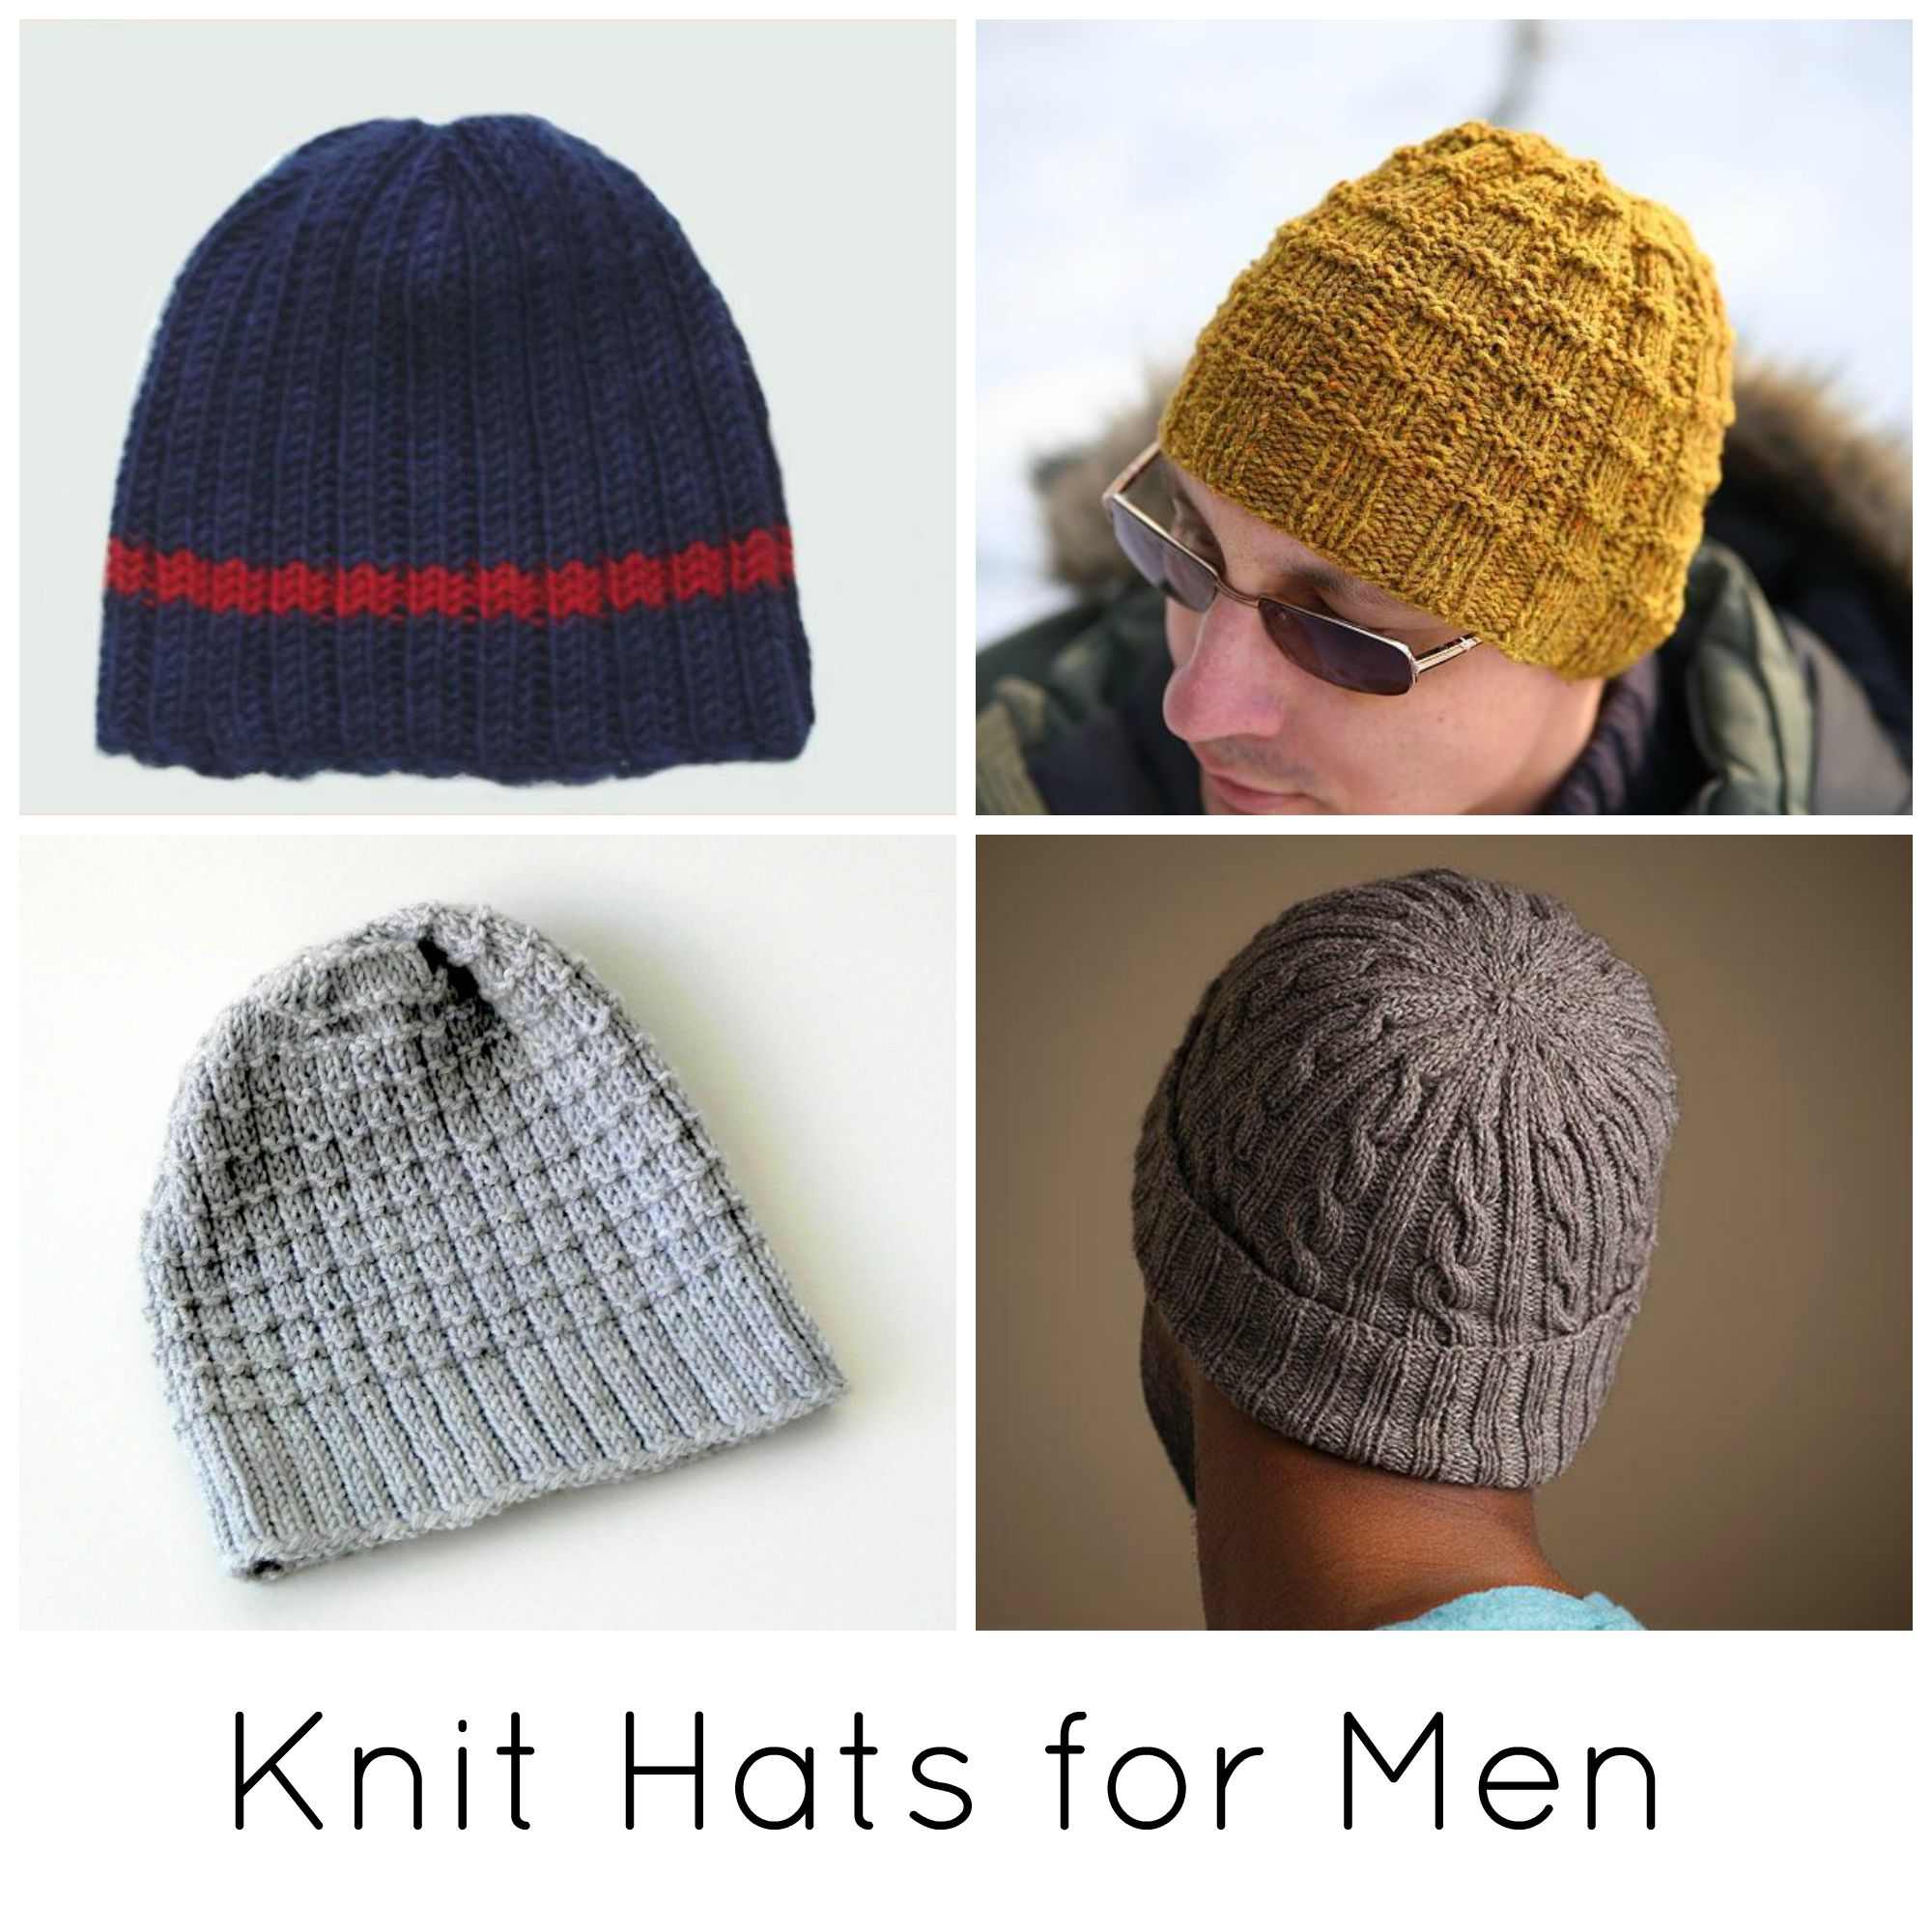 Knit Hats for Men